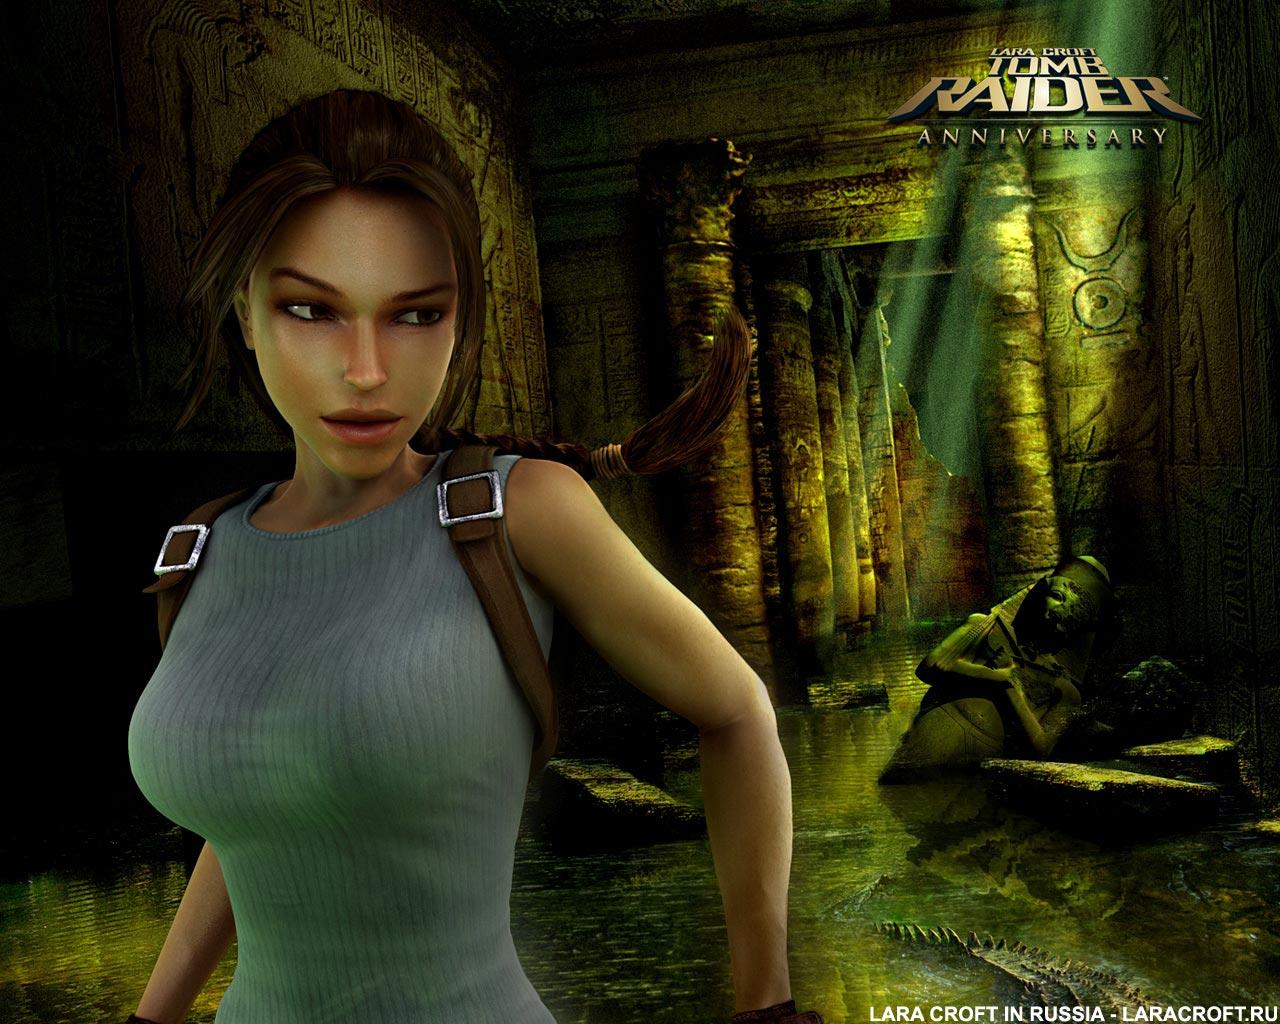 Tomb_Raider_Anniversary_A2WE45TG67NN1.jpg - Tomb Raider: Anniversary